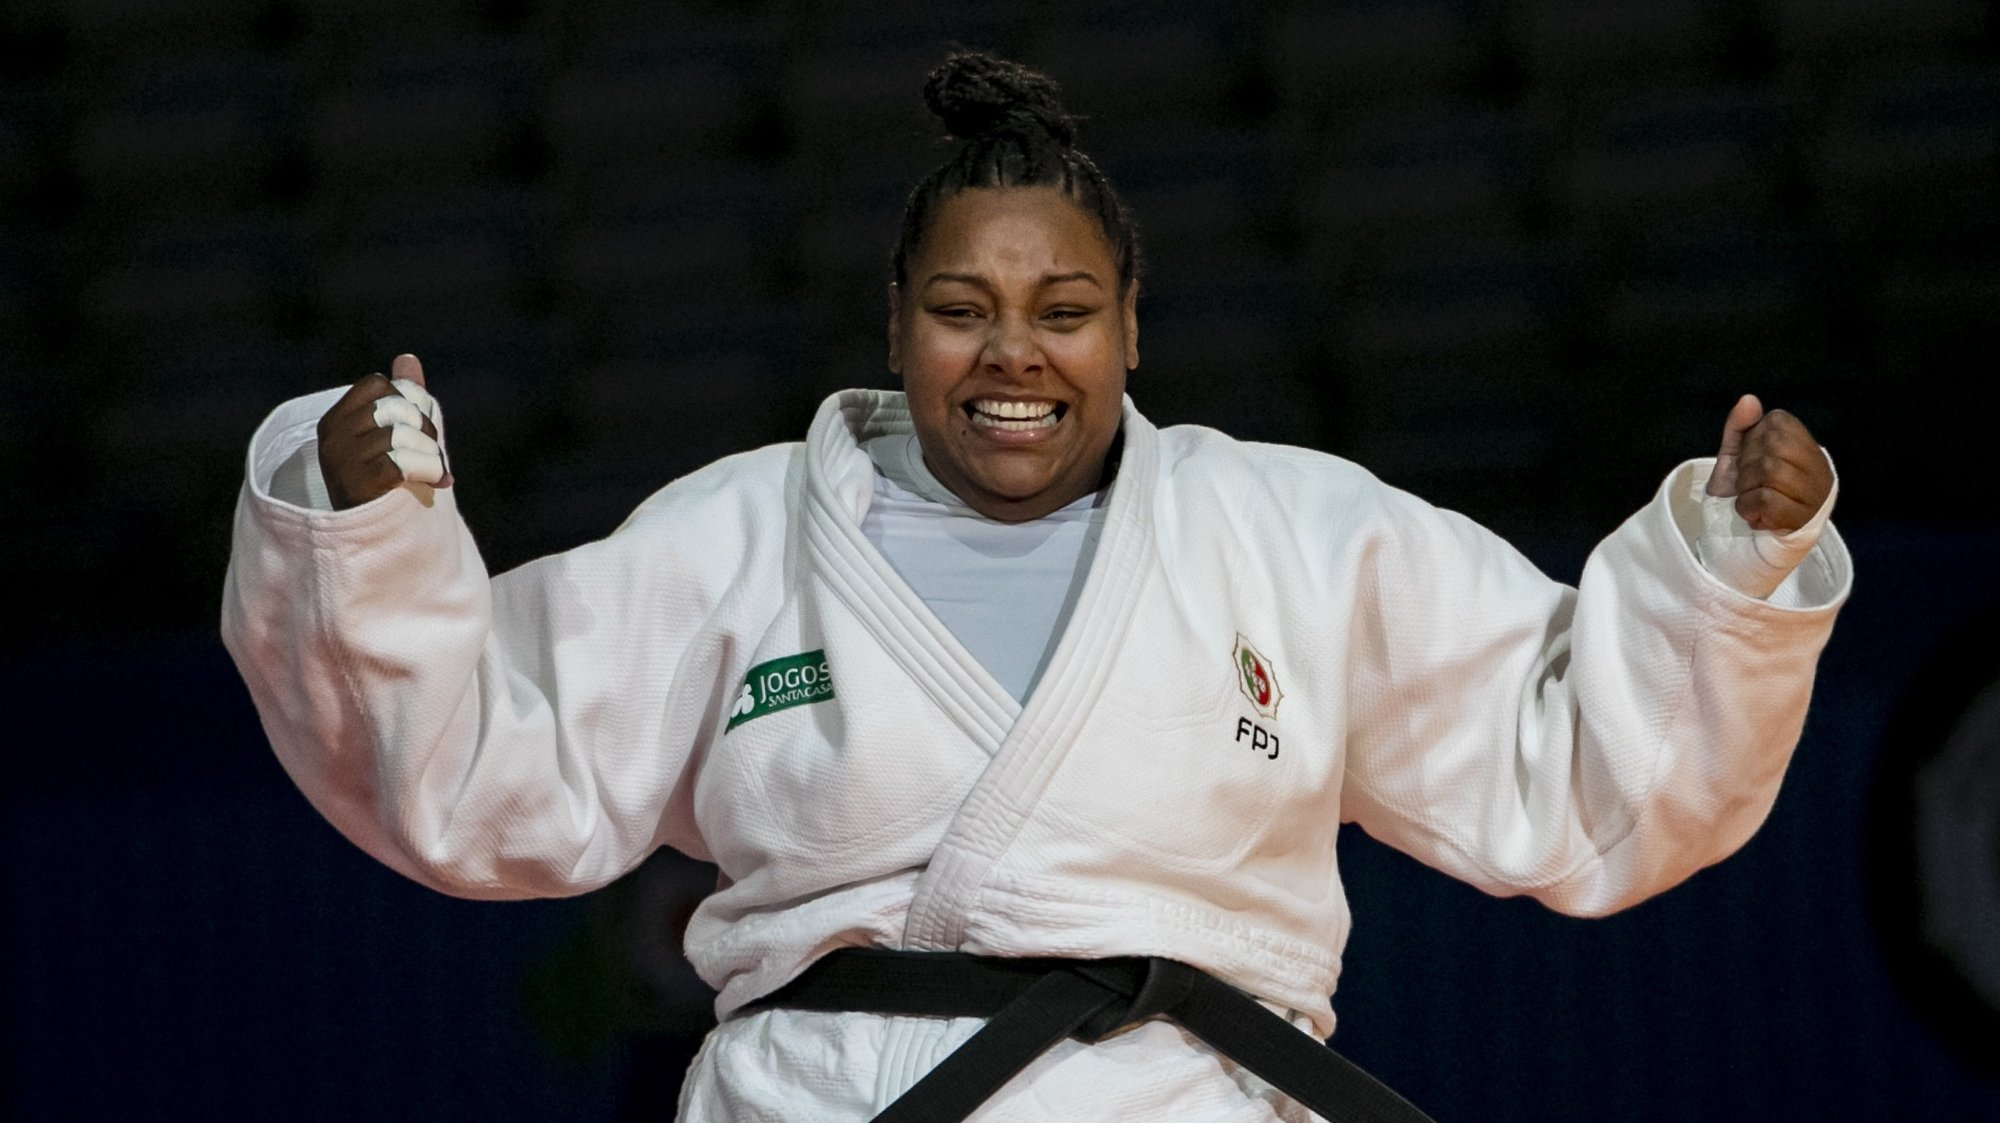 epa08834223 Rochele Nunes of Portugal celebrates winning the bronz medal bout in the women's +78kg category at the European Judo Championships in Prague, Czech Republic, 21 November 2020.  EPA/MARTIN DIVISEK hm